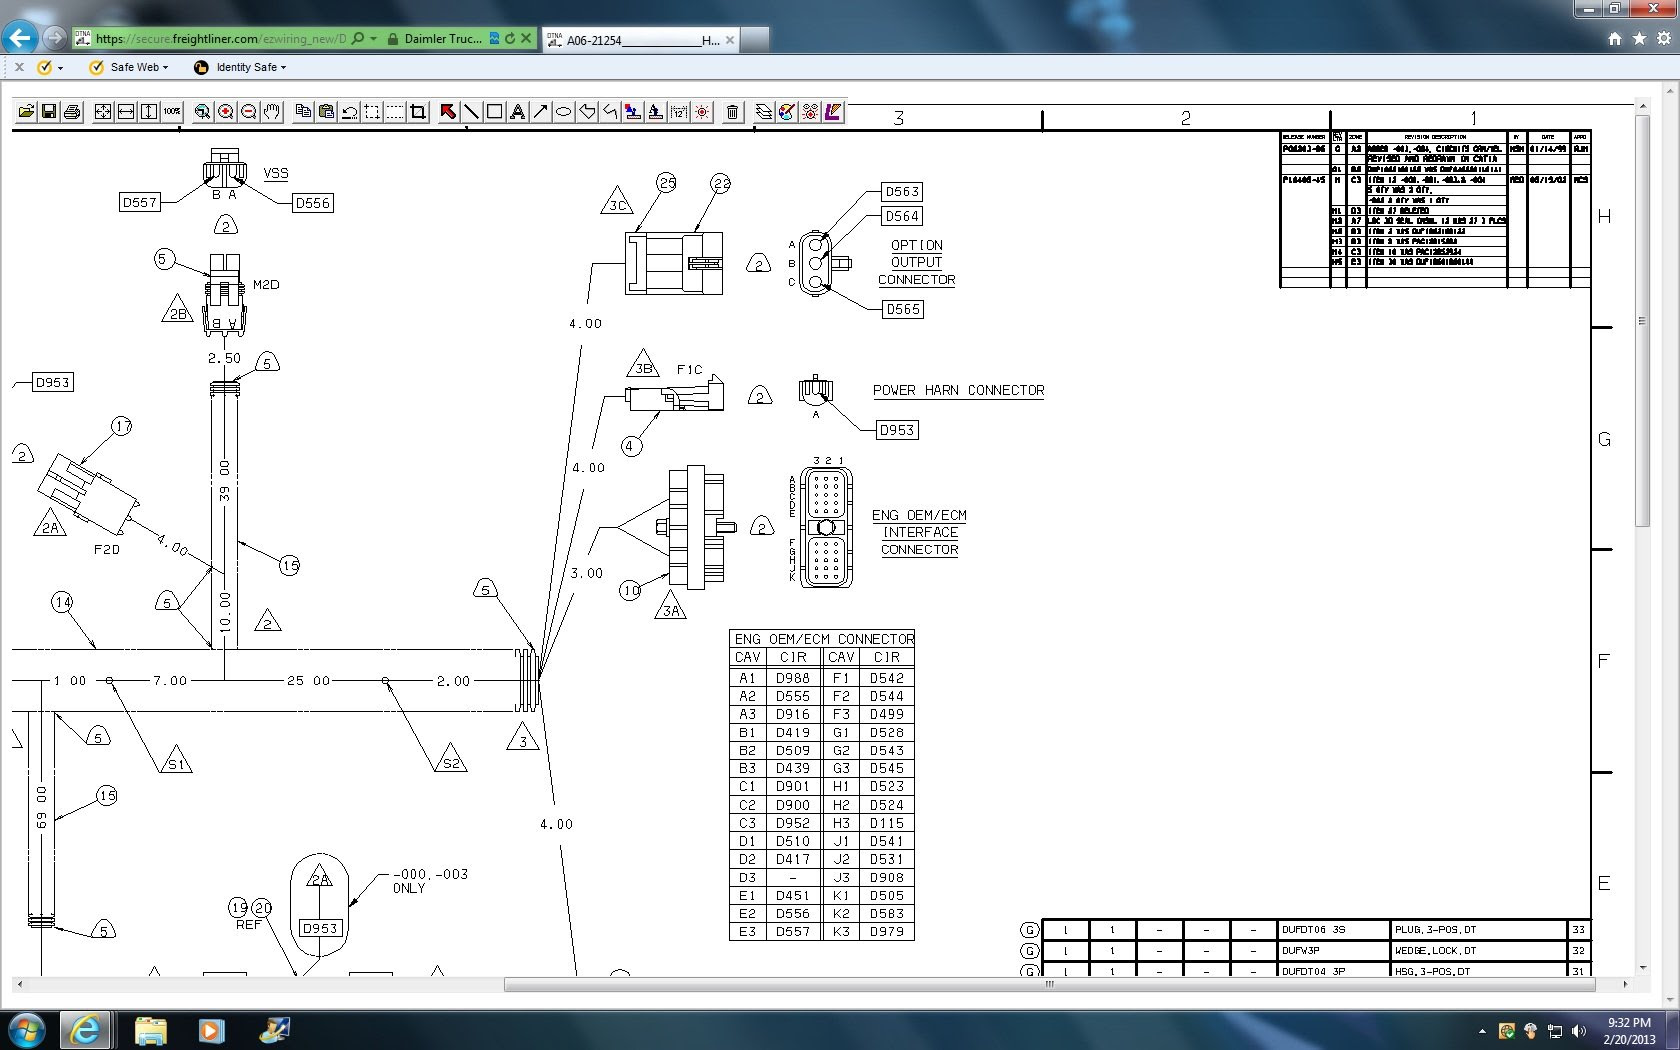 detroit series 60 ecm wiring diagram diagram stream. Black Bedroom Furniture Sets. Home Design Ideas